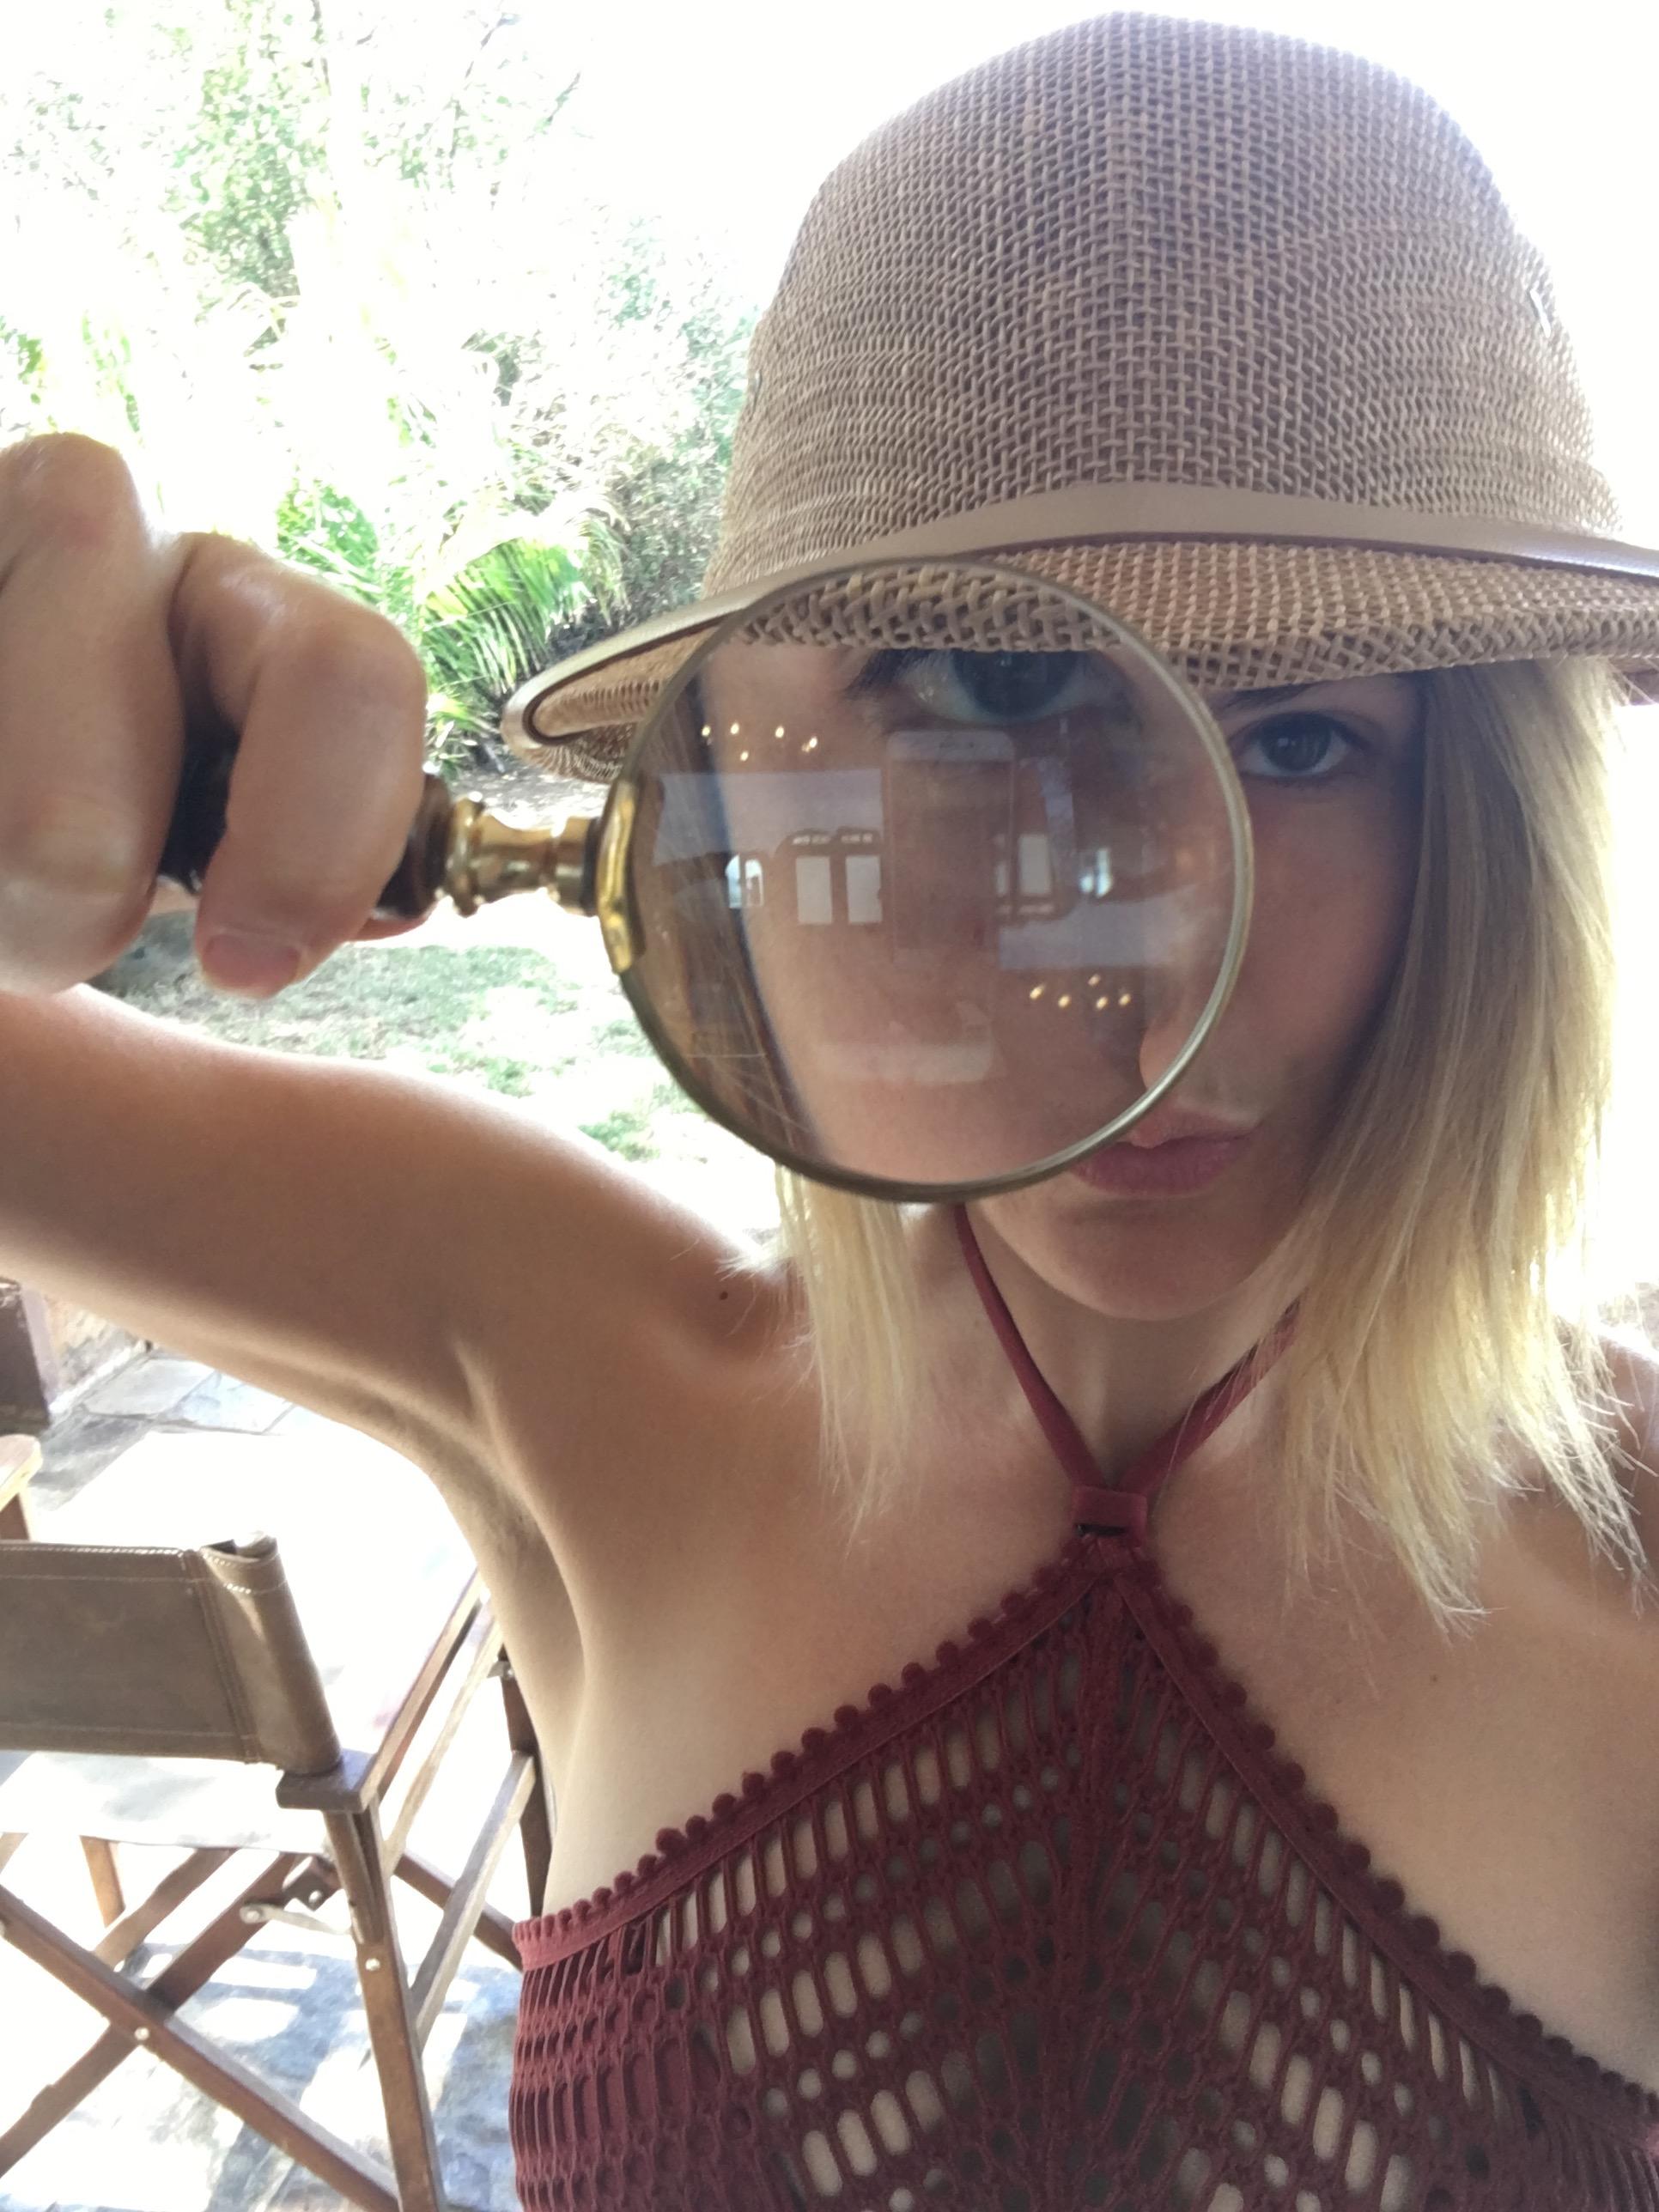 Lauren Badell - Content Editor / Writer